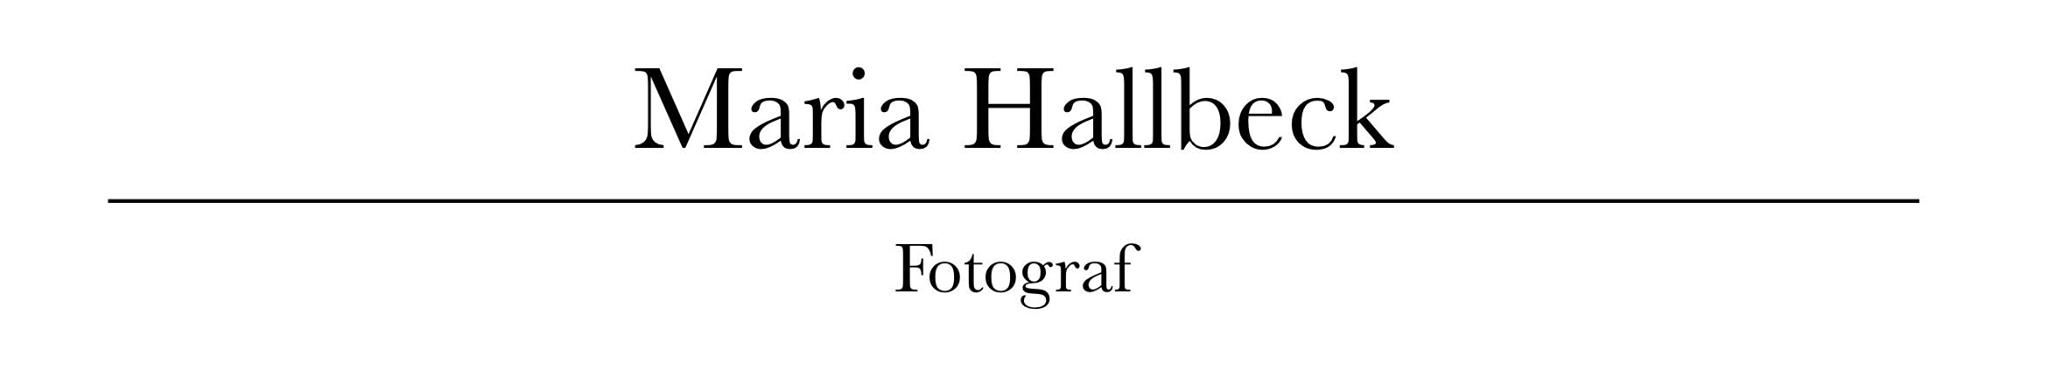 Maria Hallbeck